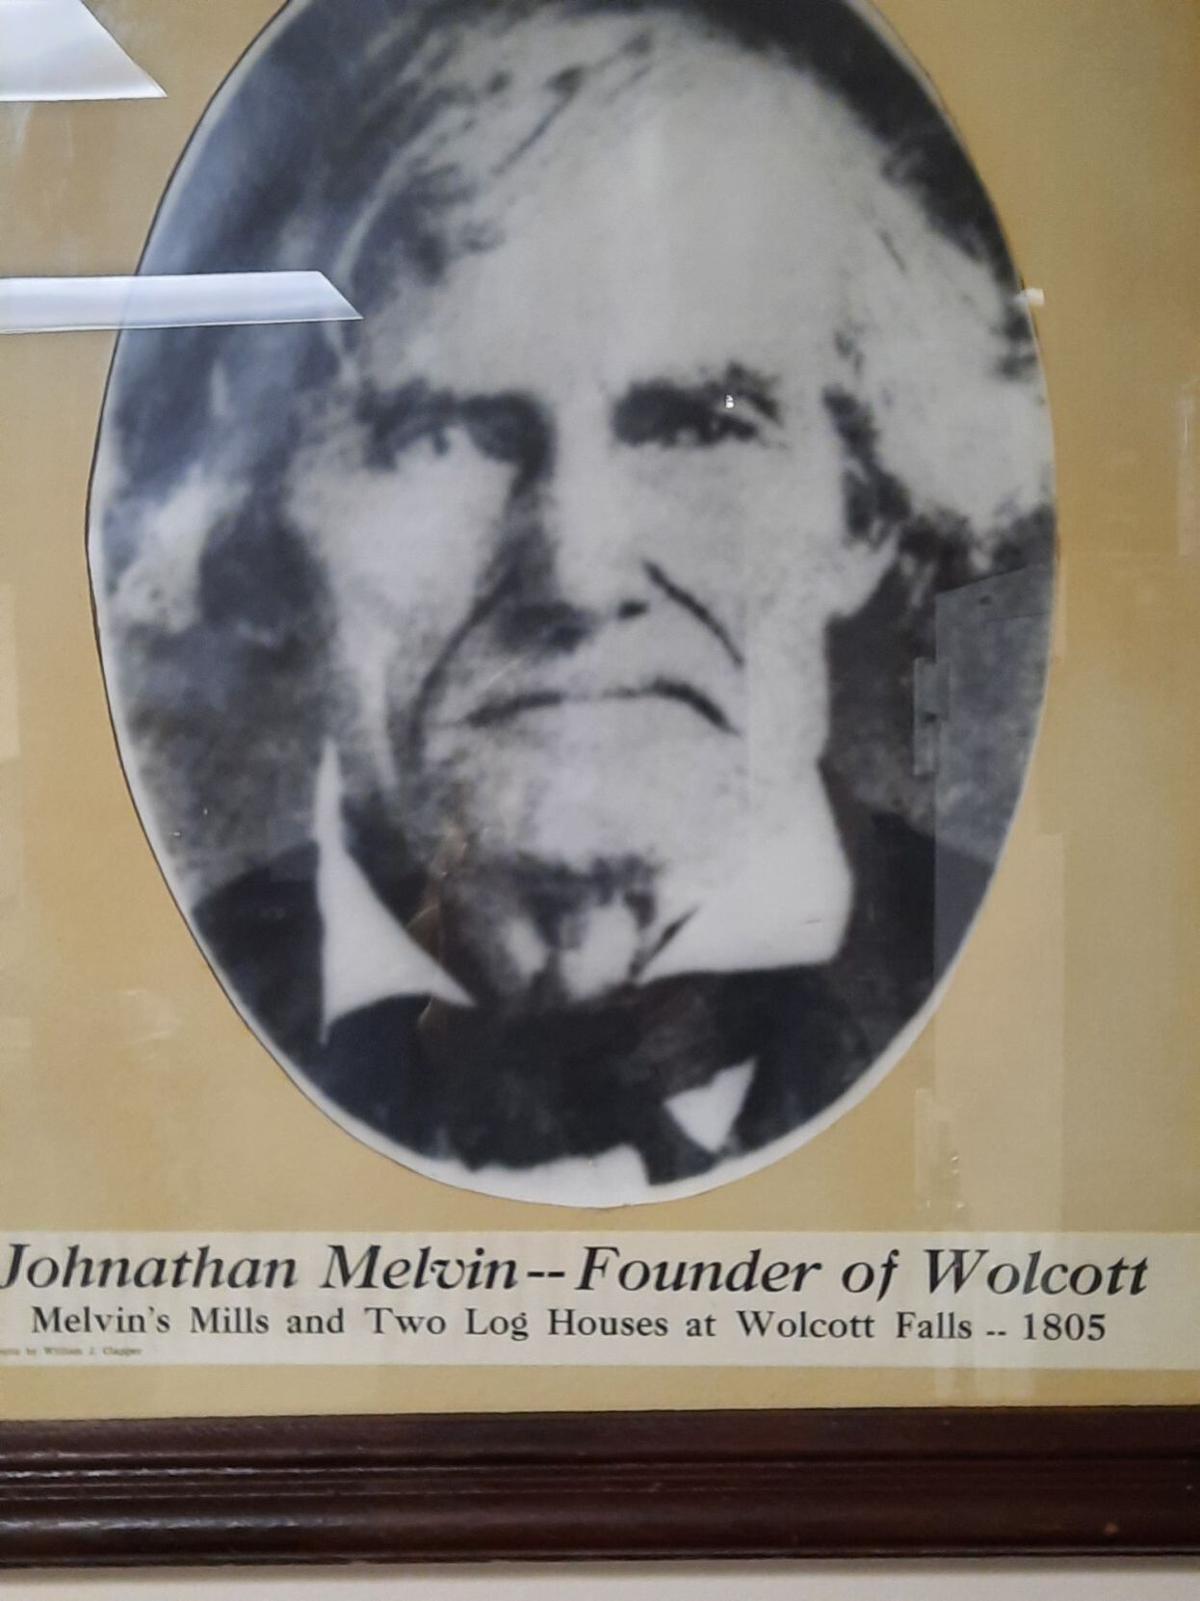 Jonathan Melvin